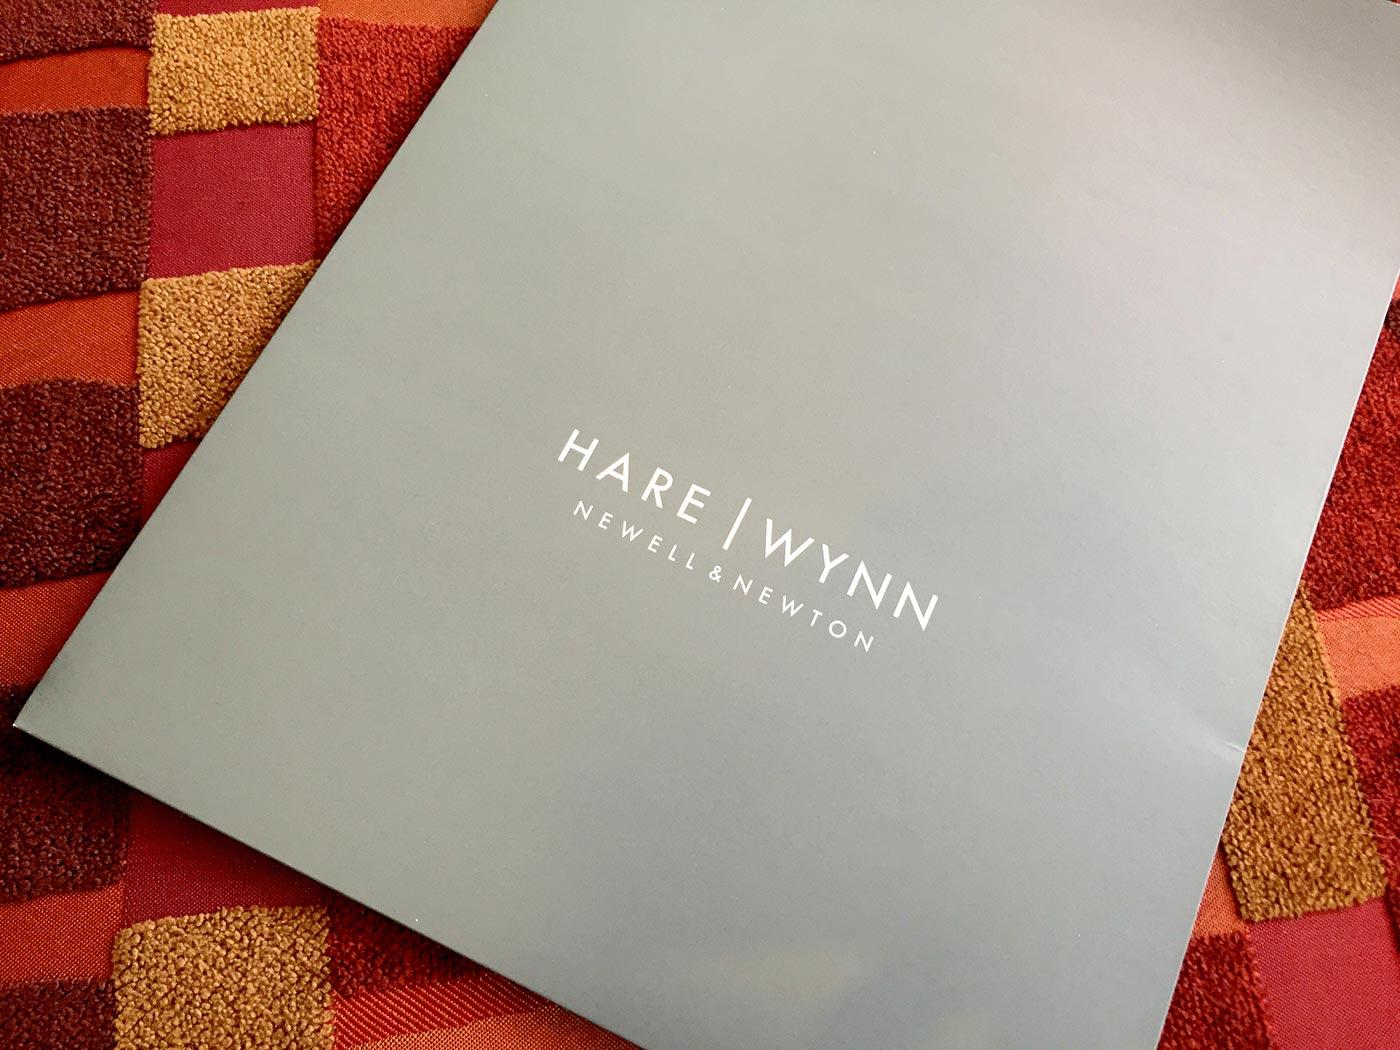 hare wynn